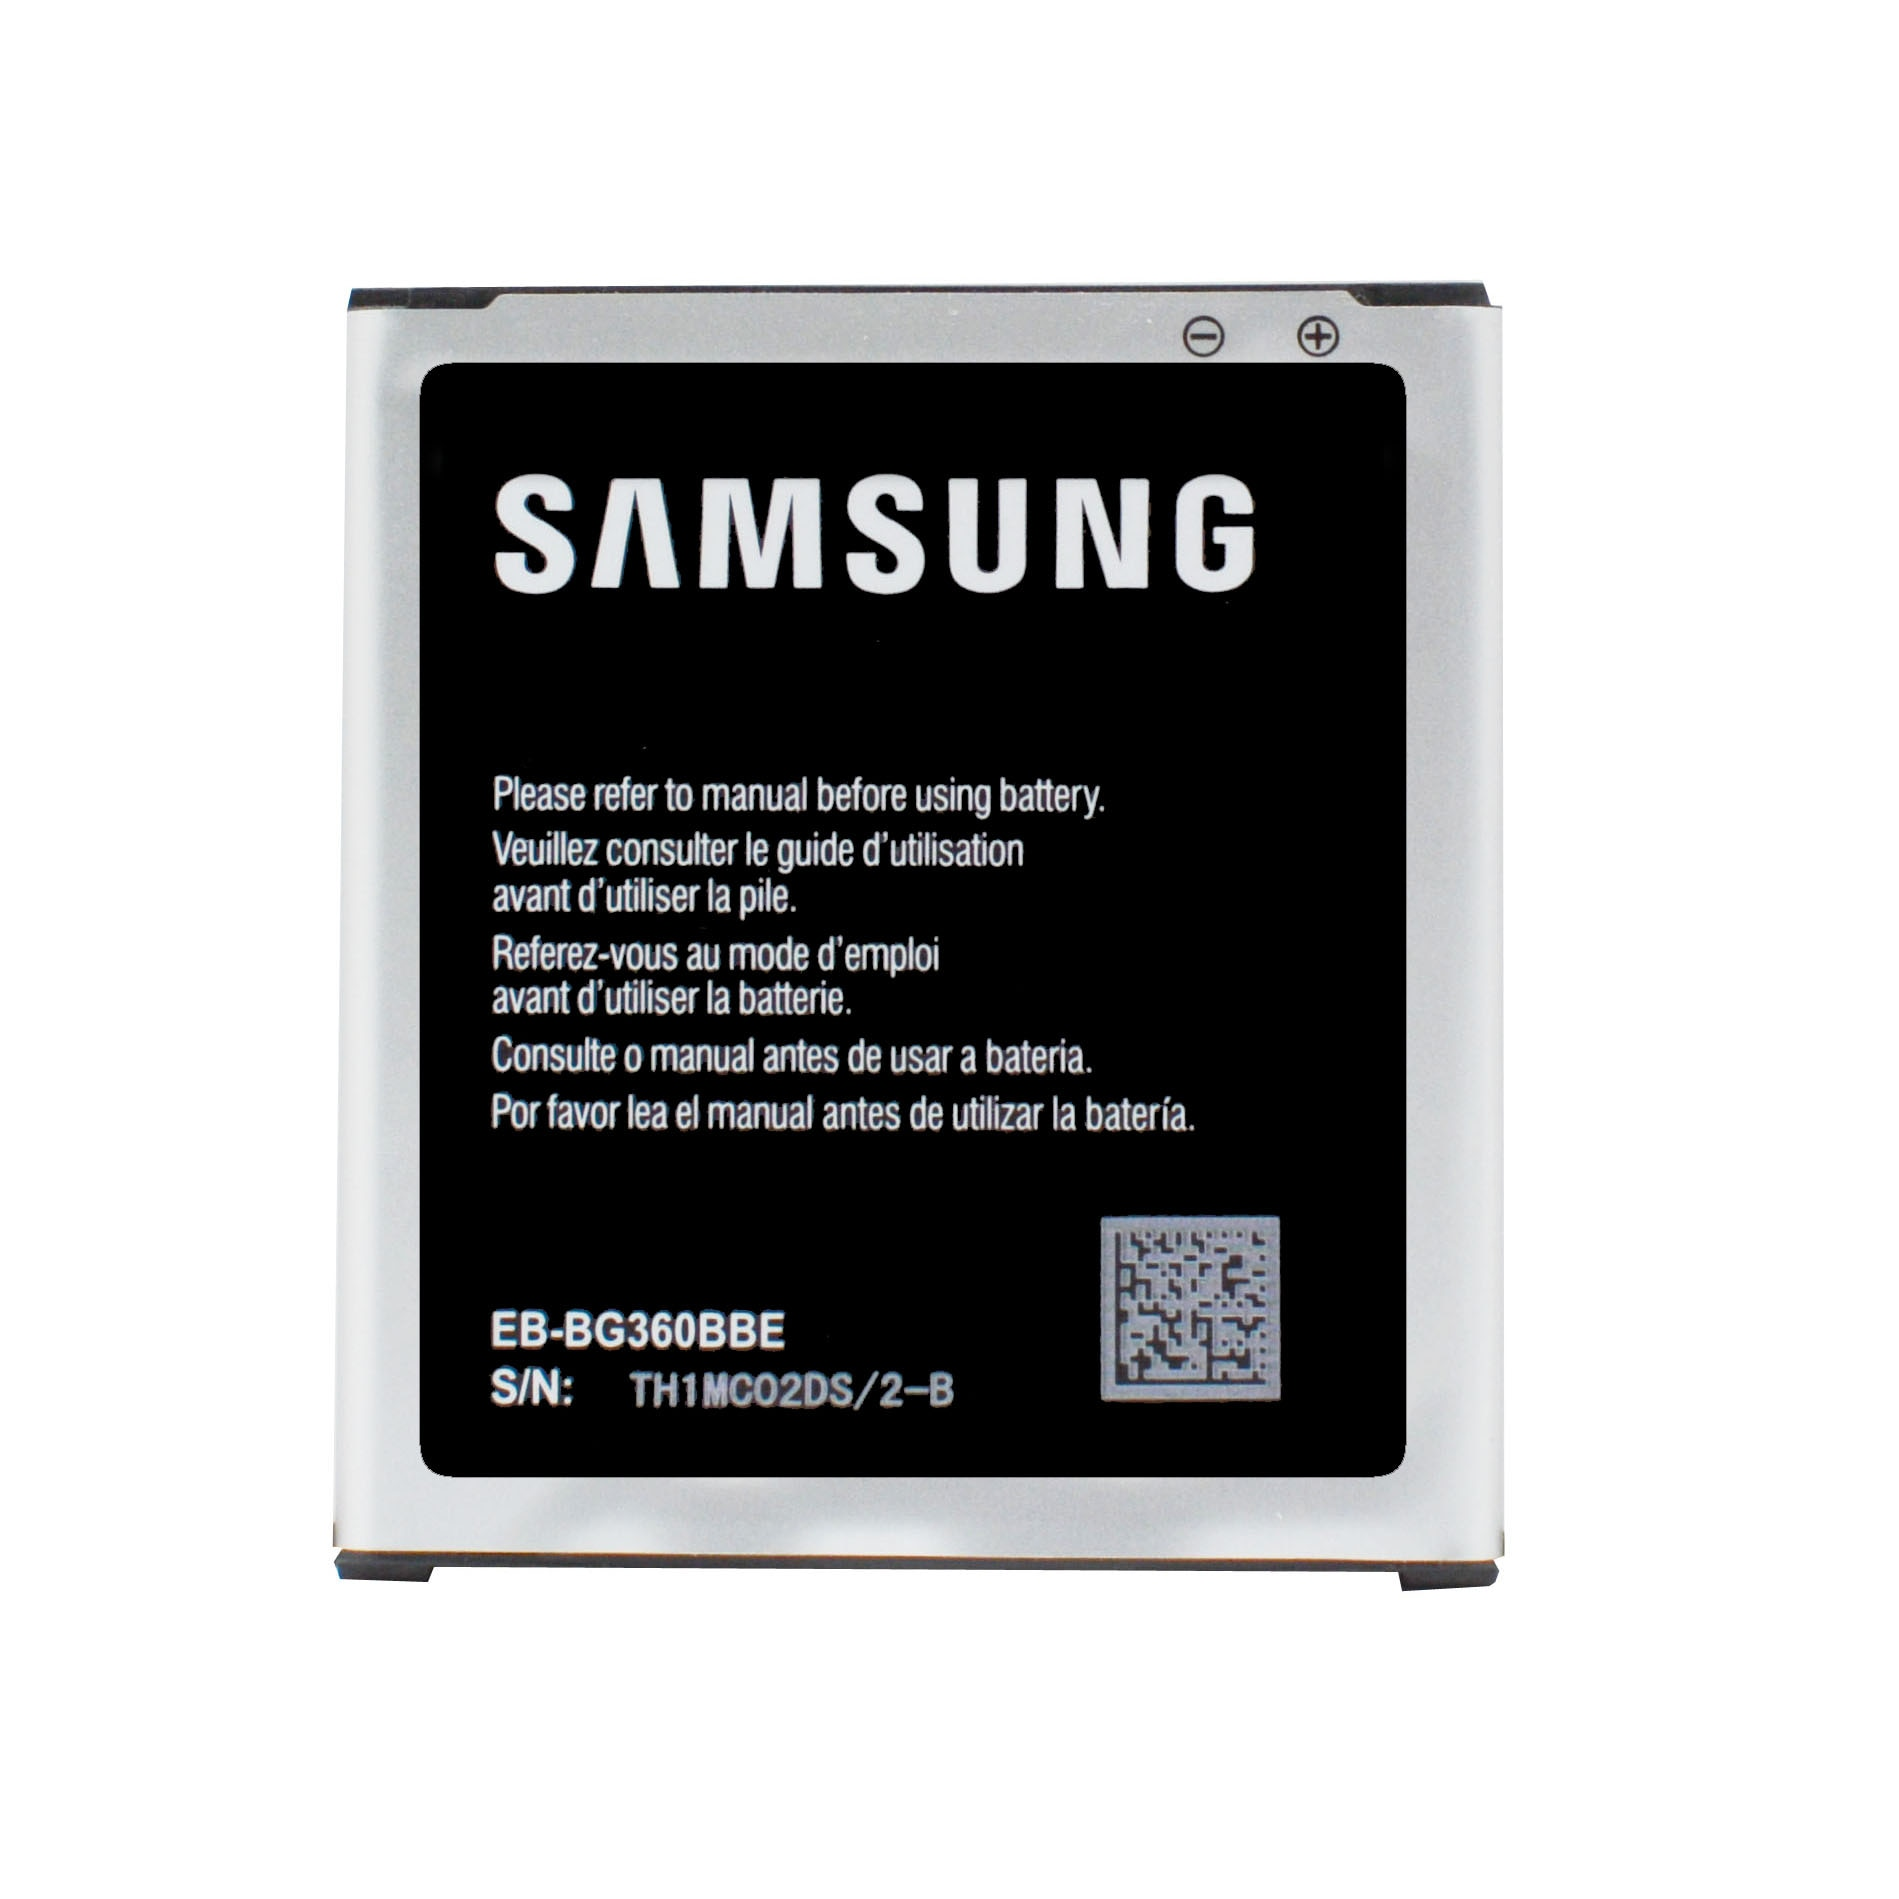 20pcs/lot High Quality Battery EB-BG360BBE/EB-BG360CBE/BBU For Samsung Galaxy Core Prime G360 G361 G360V G3608 G360H Bateria enlarge